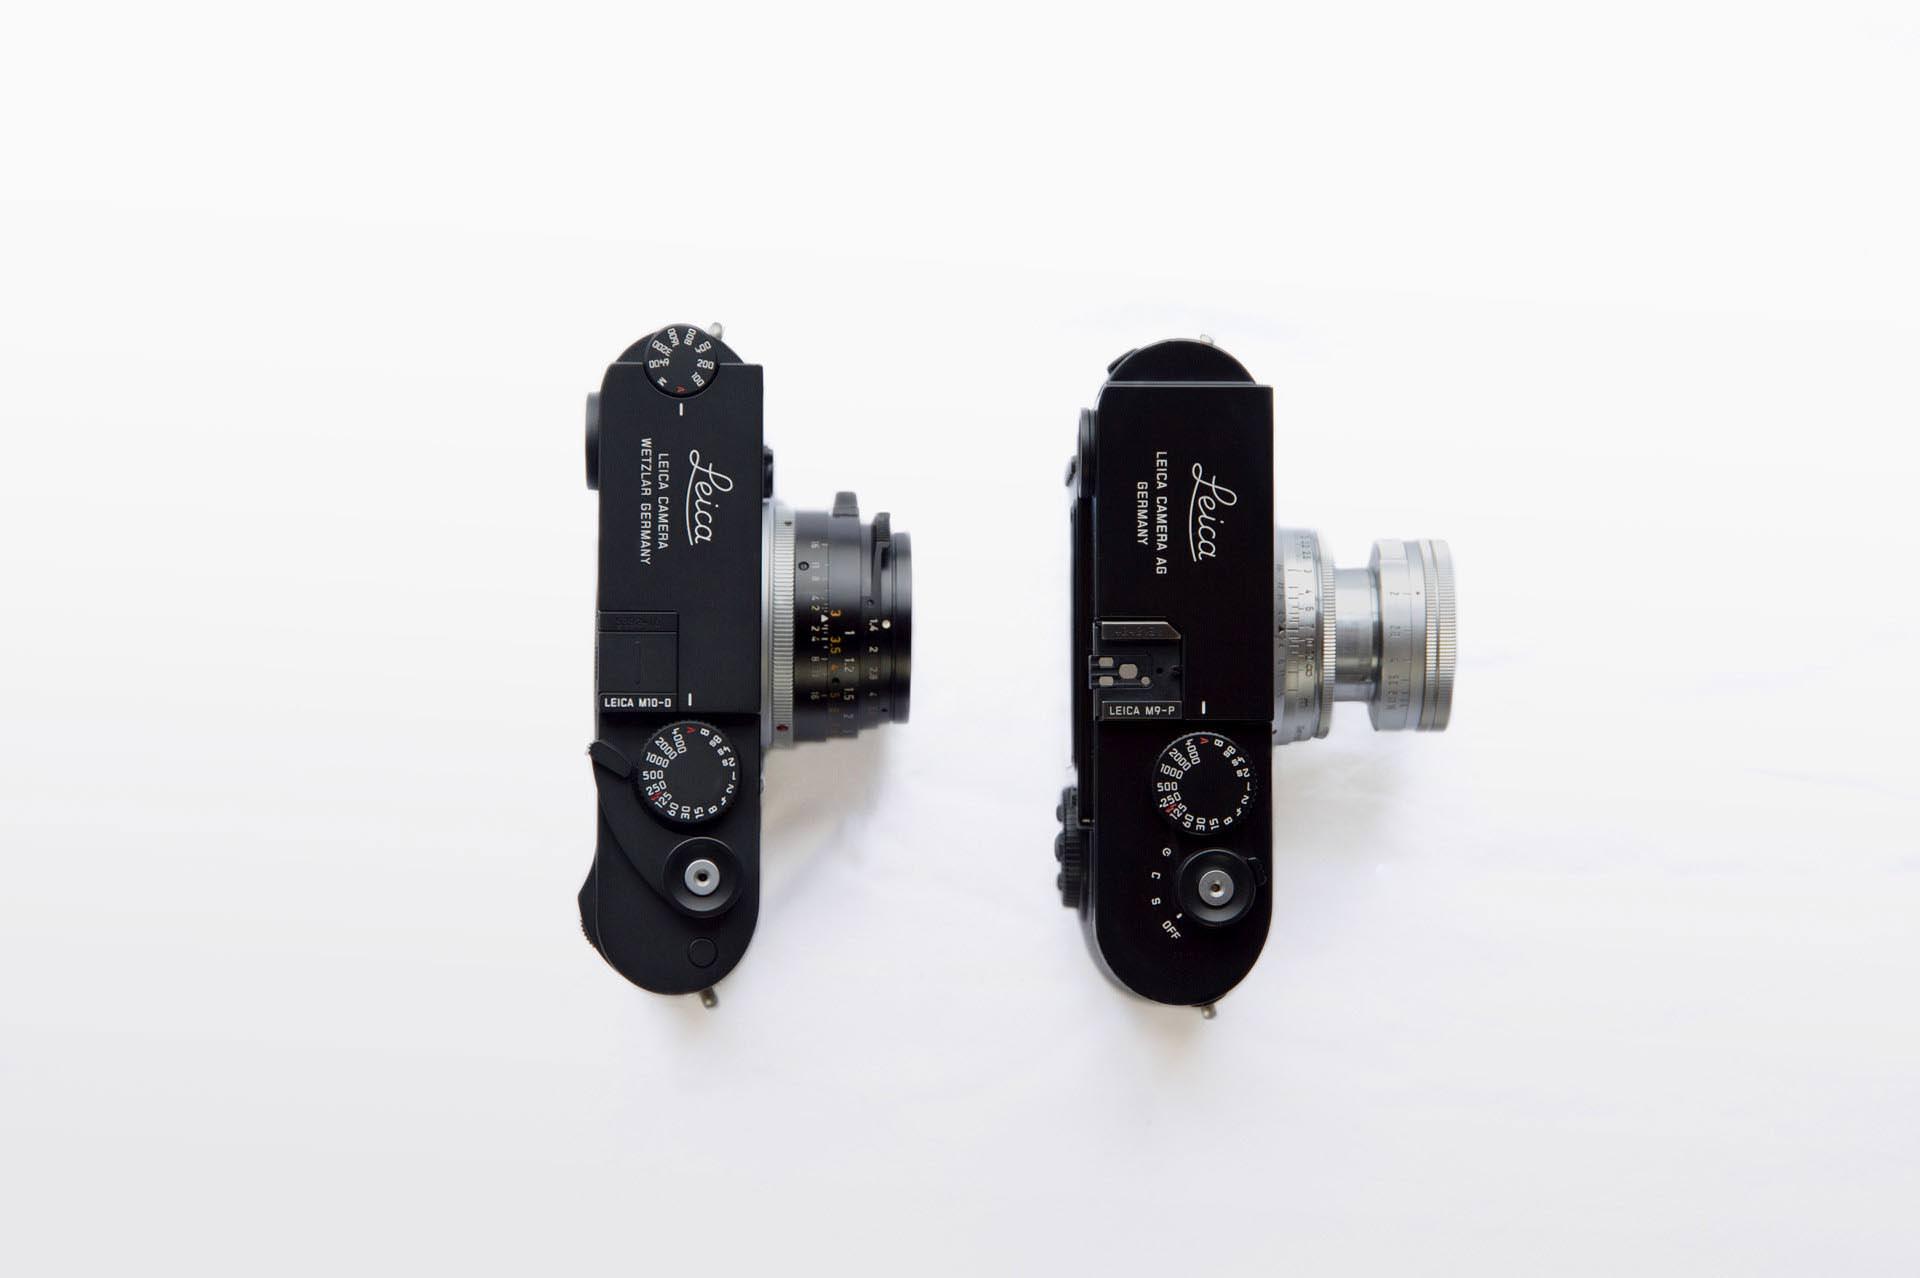 Leica M10-Dを手にした結果、レビュー